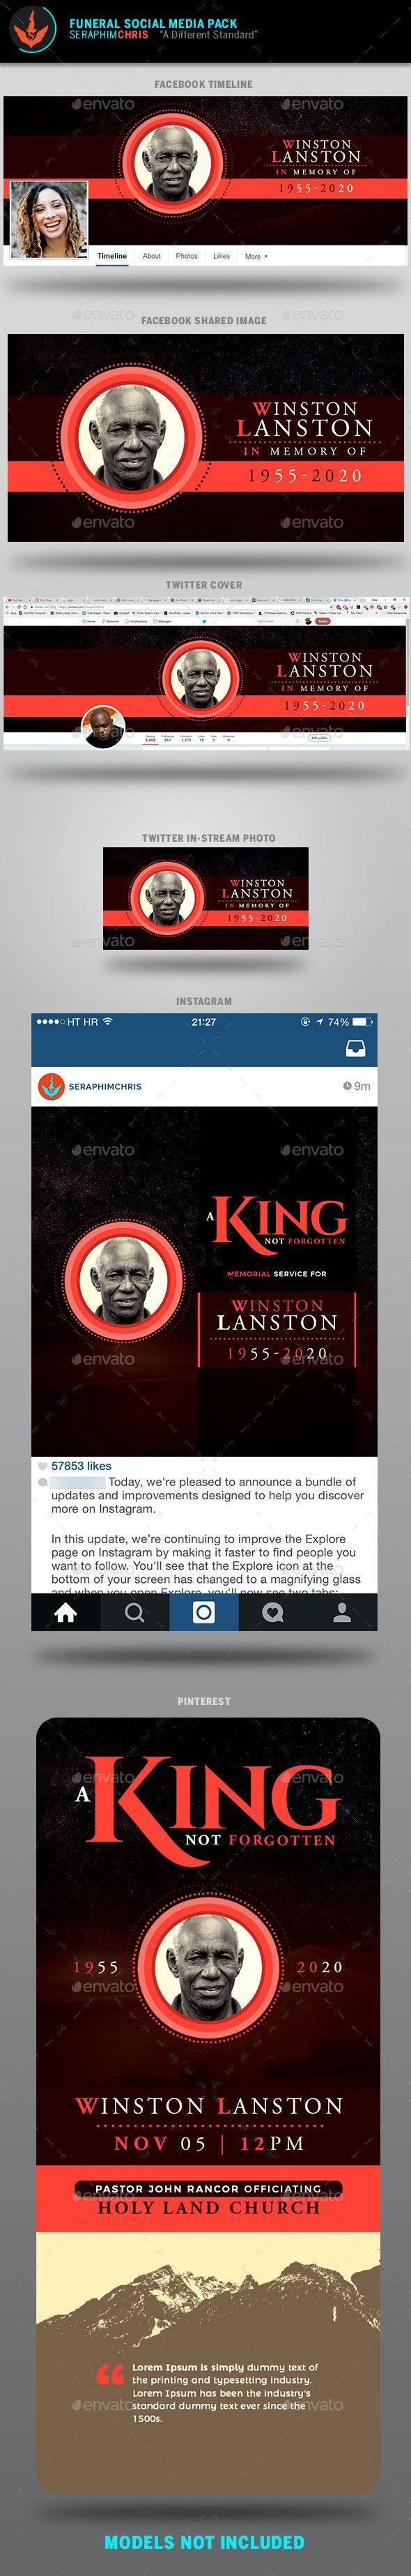 King Funeral Social Media Template Pack - Facebook Timeline Covers Social Media